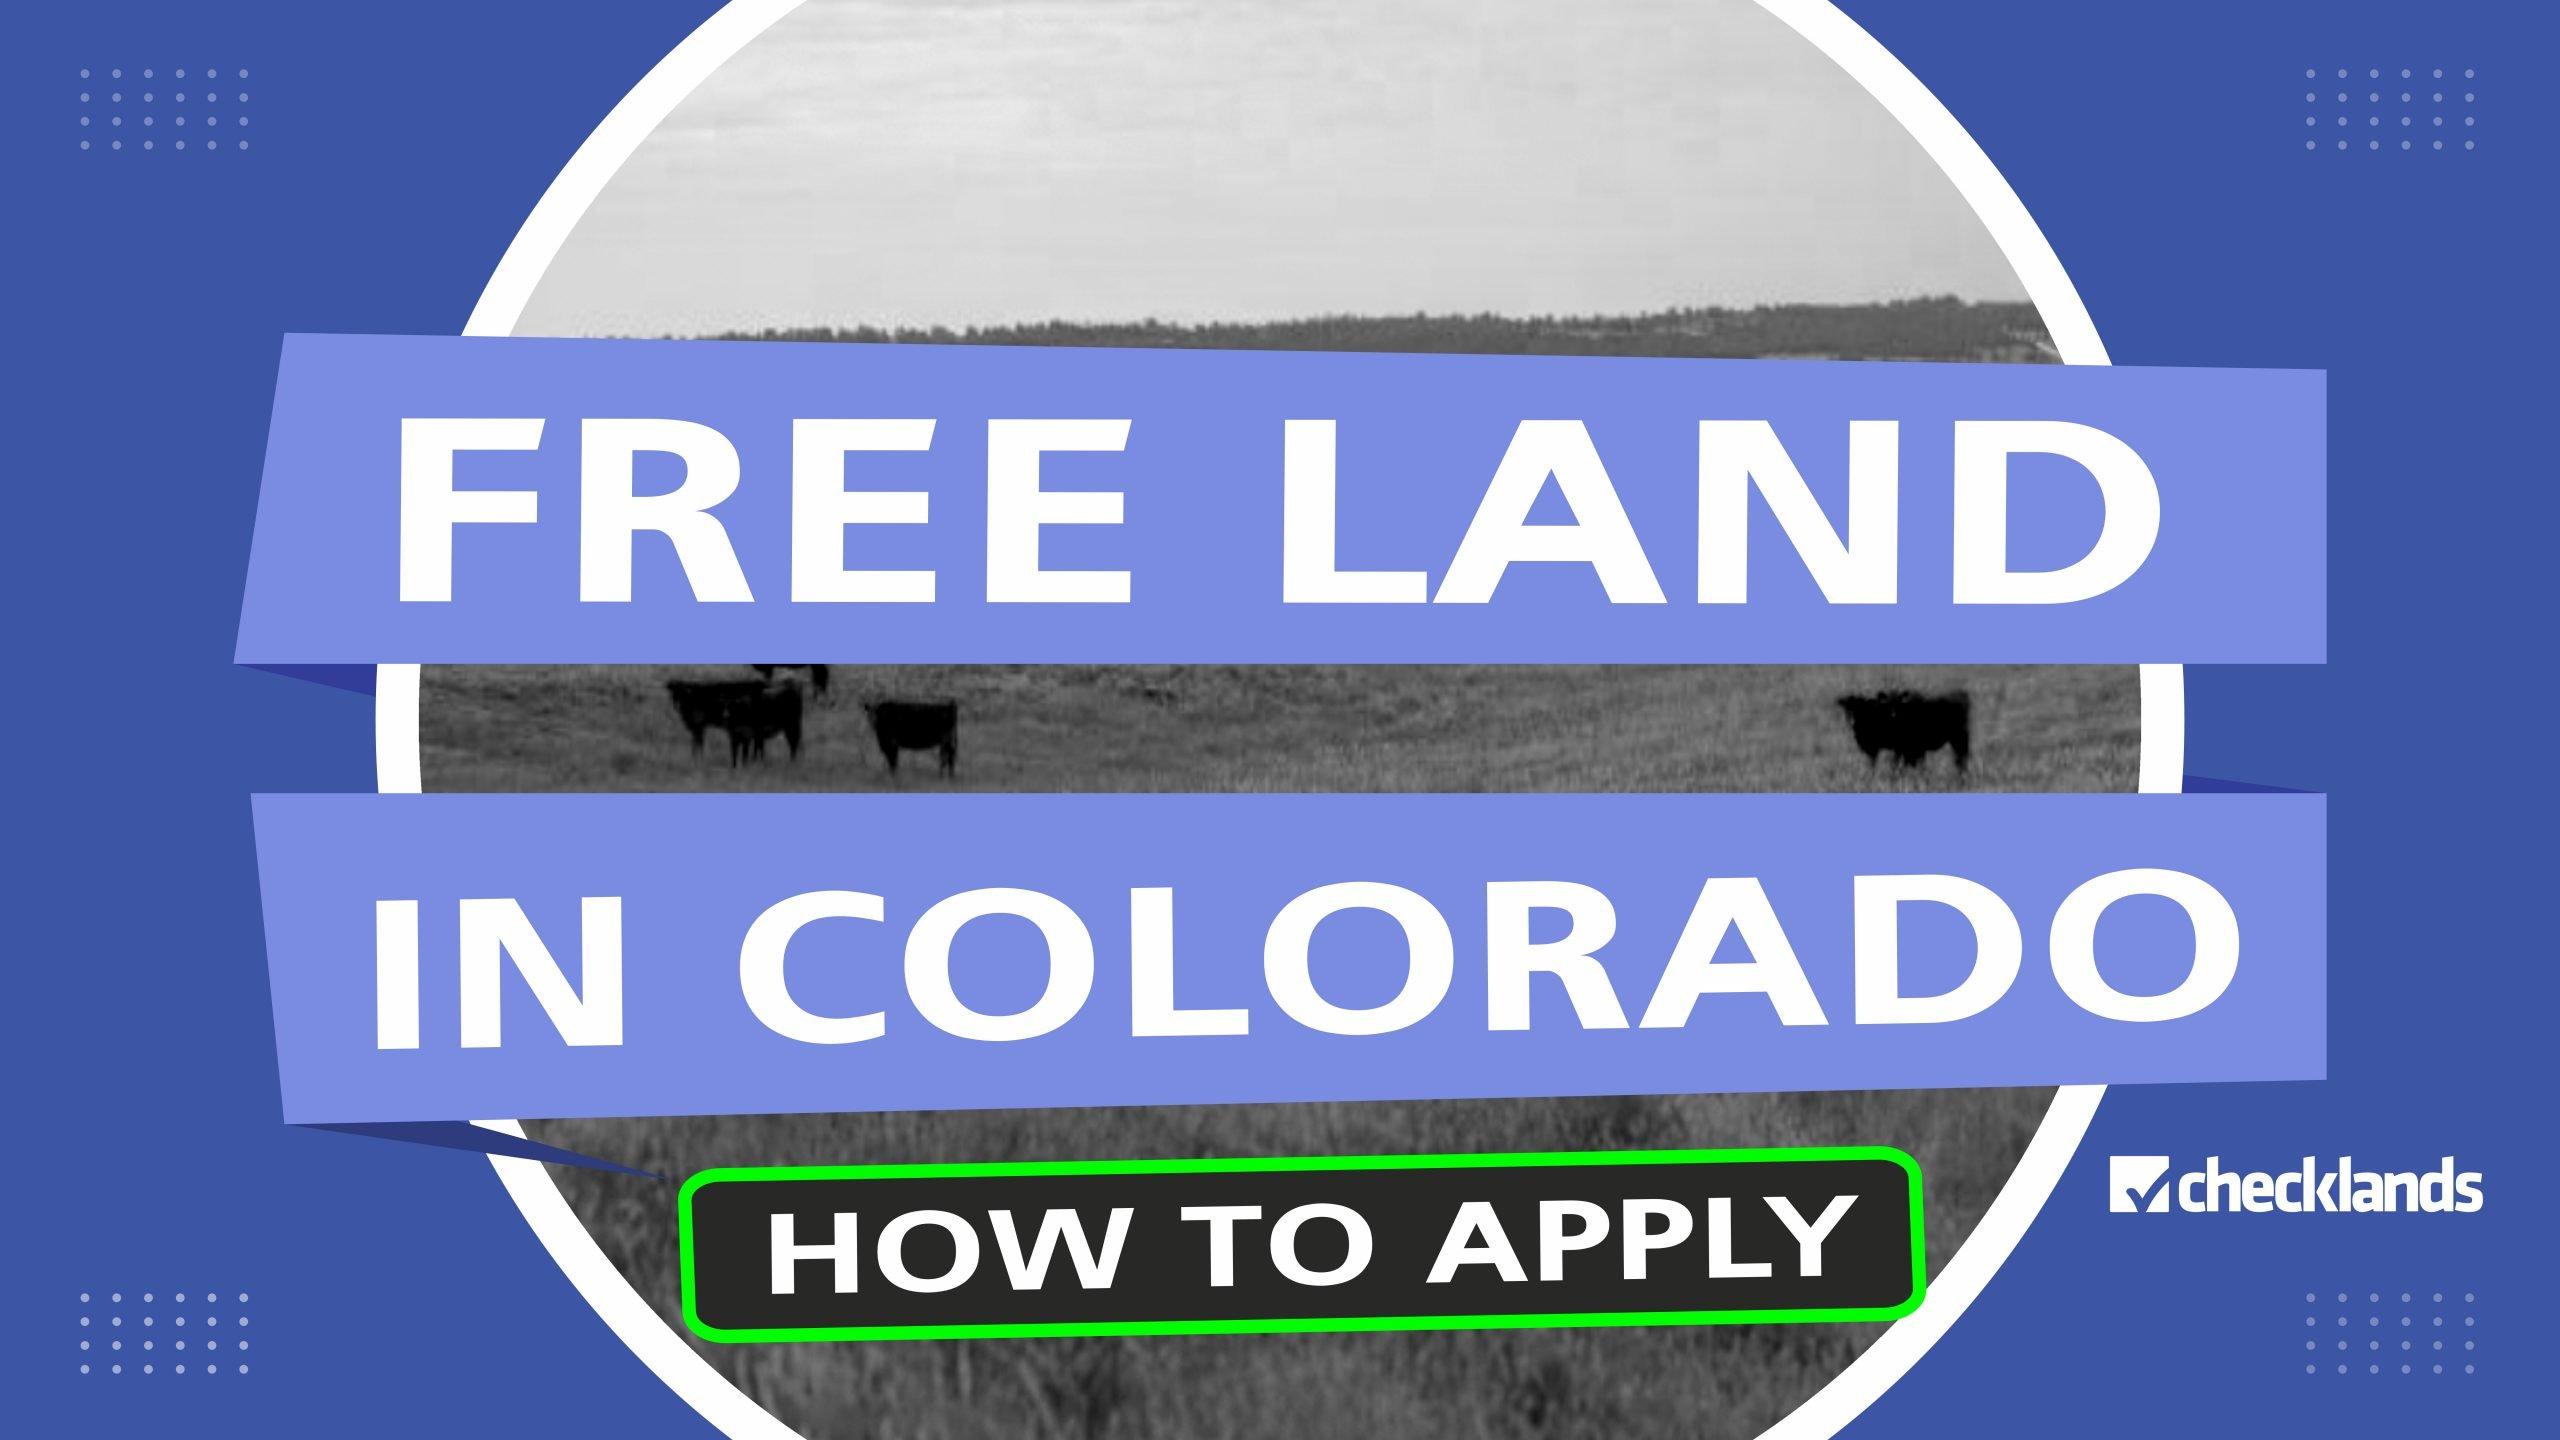 Free Land In Colorado Scaled, Checklands